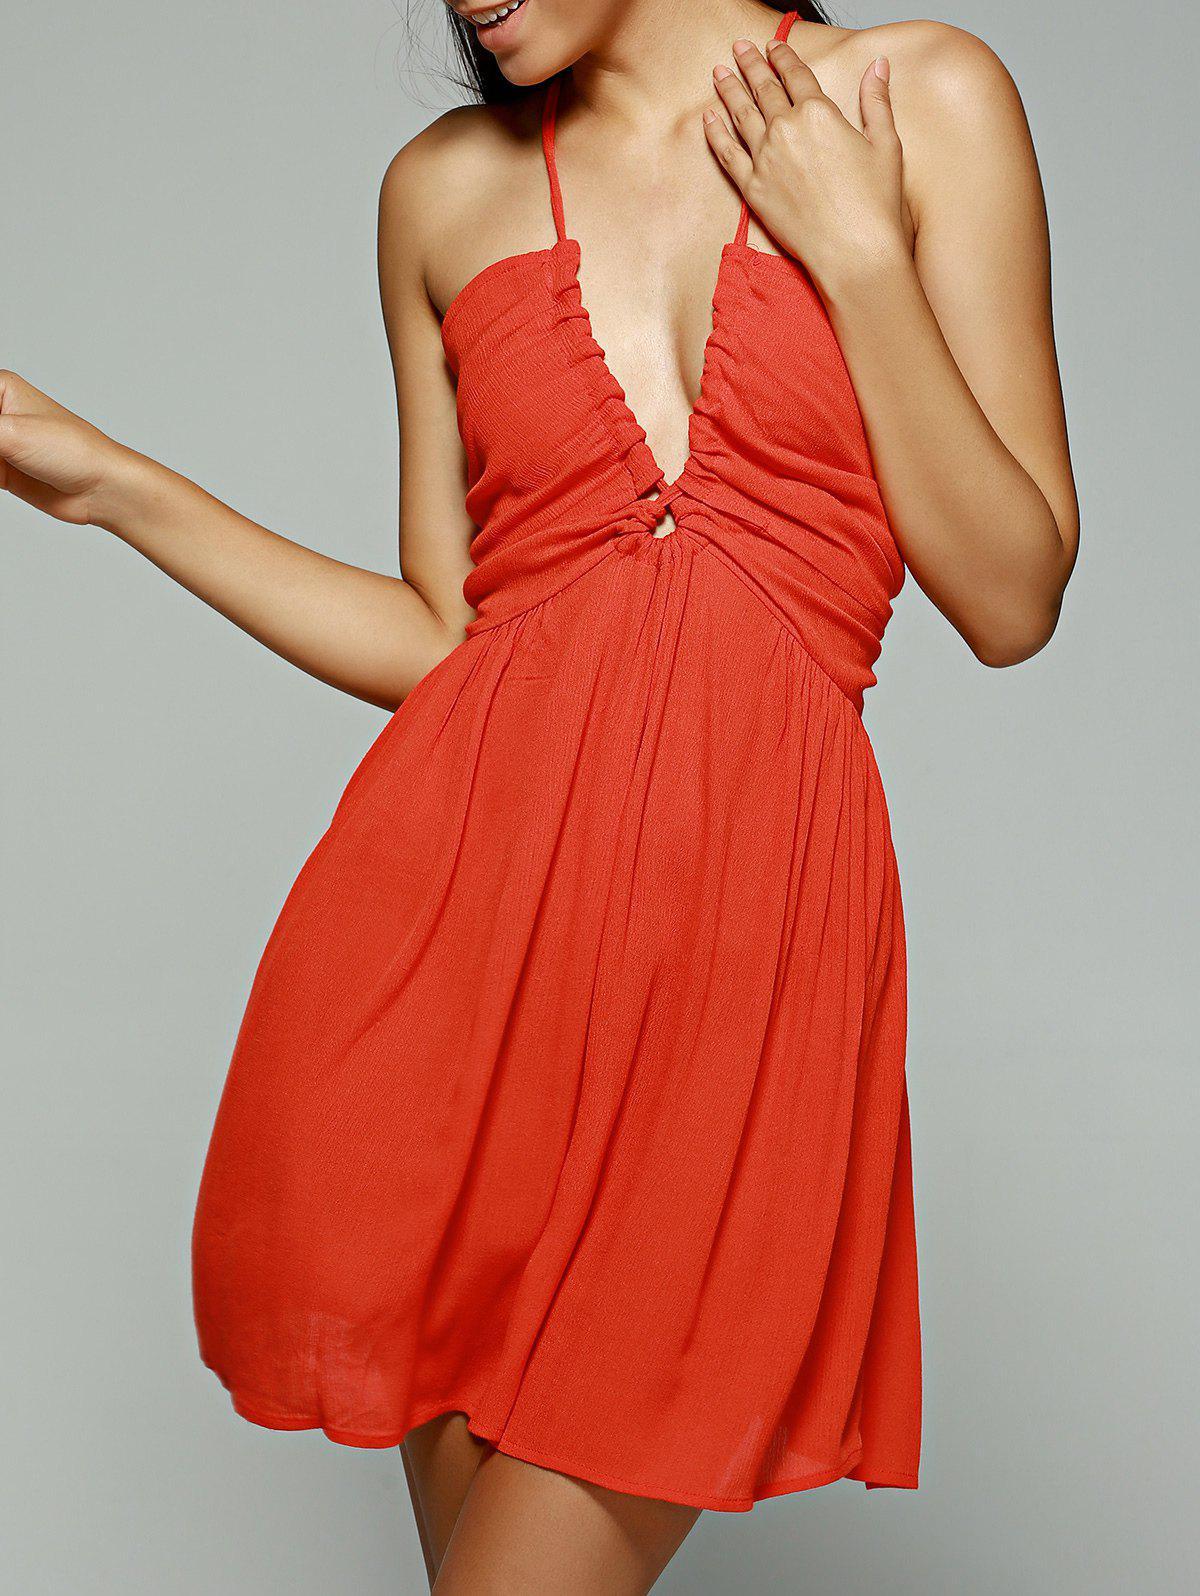 Orange Red Plunging Neck Sleeveless Chiffon Dress 188089002